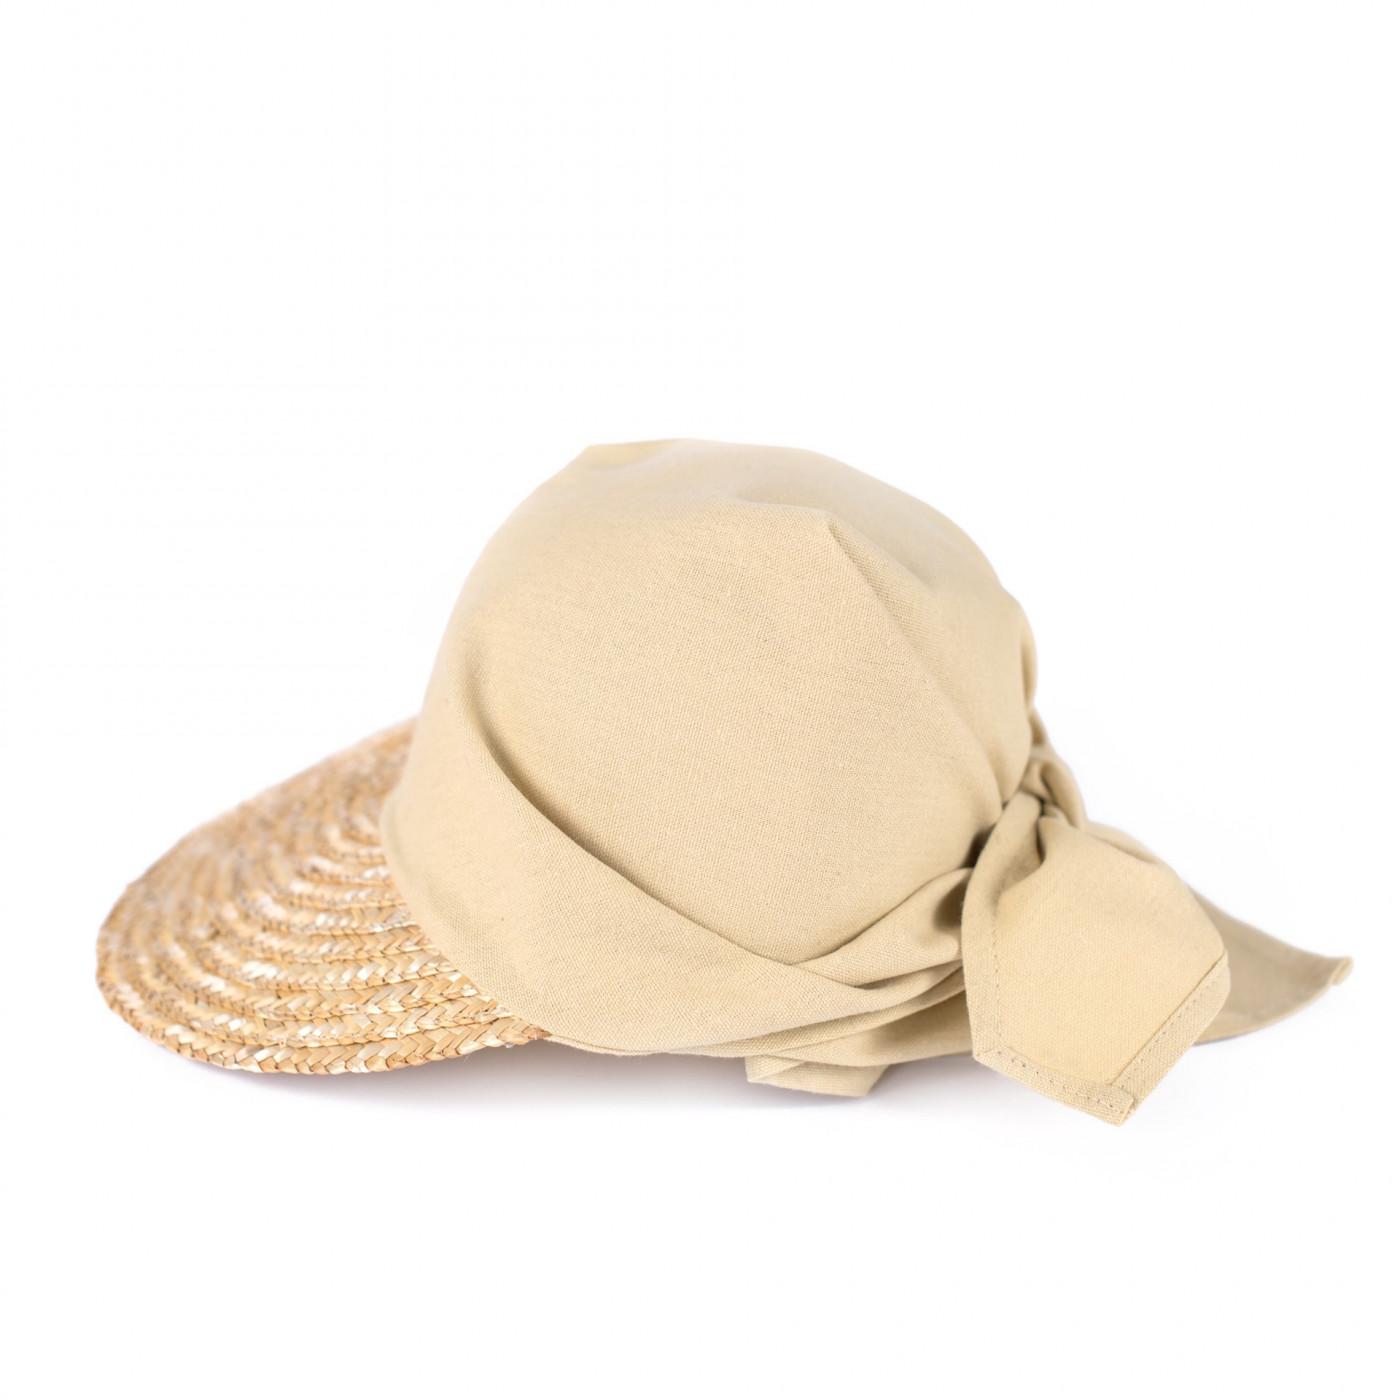 Art Of Polo Woman's Visor Hat cz19431